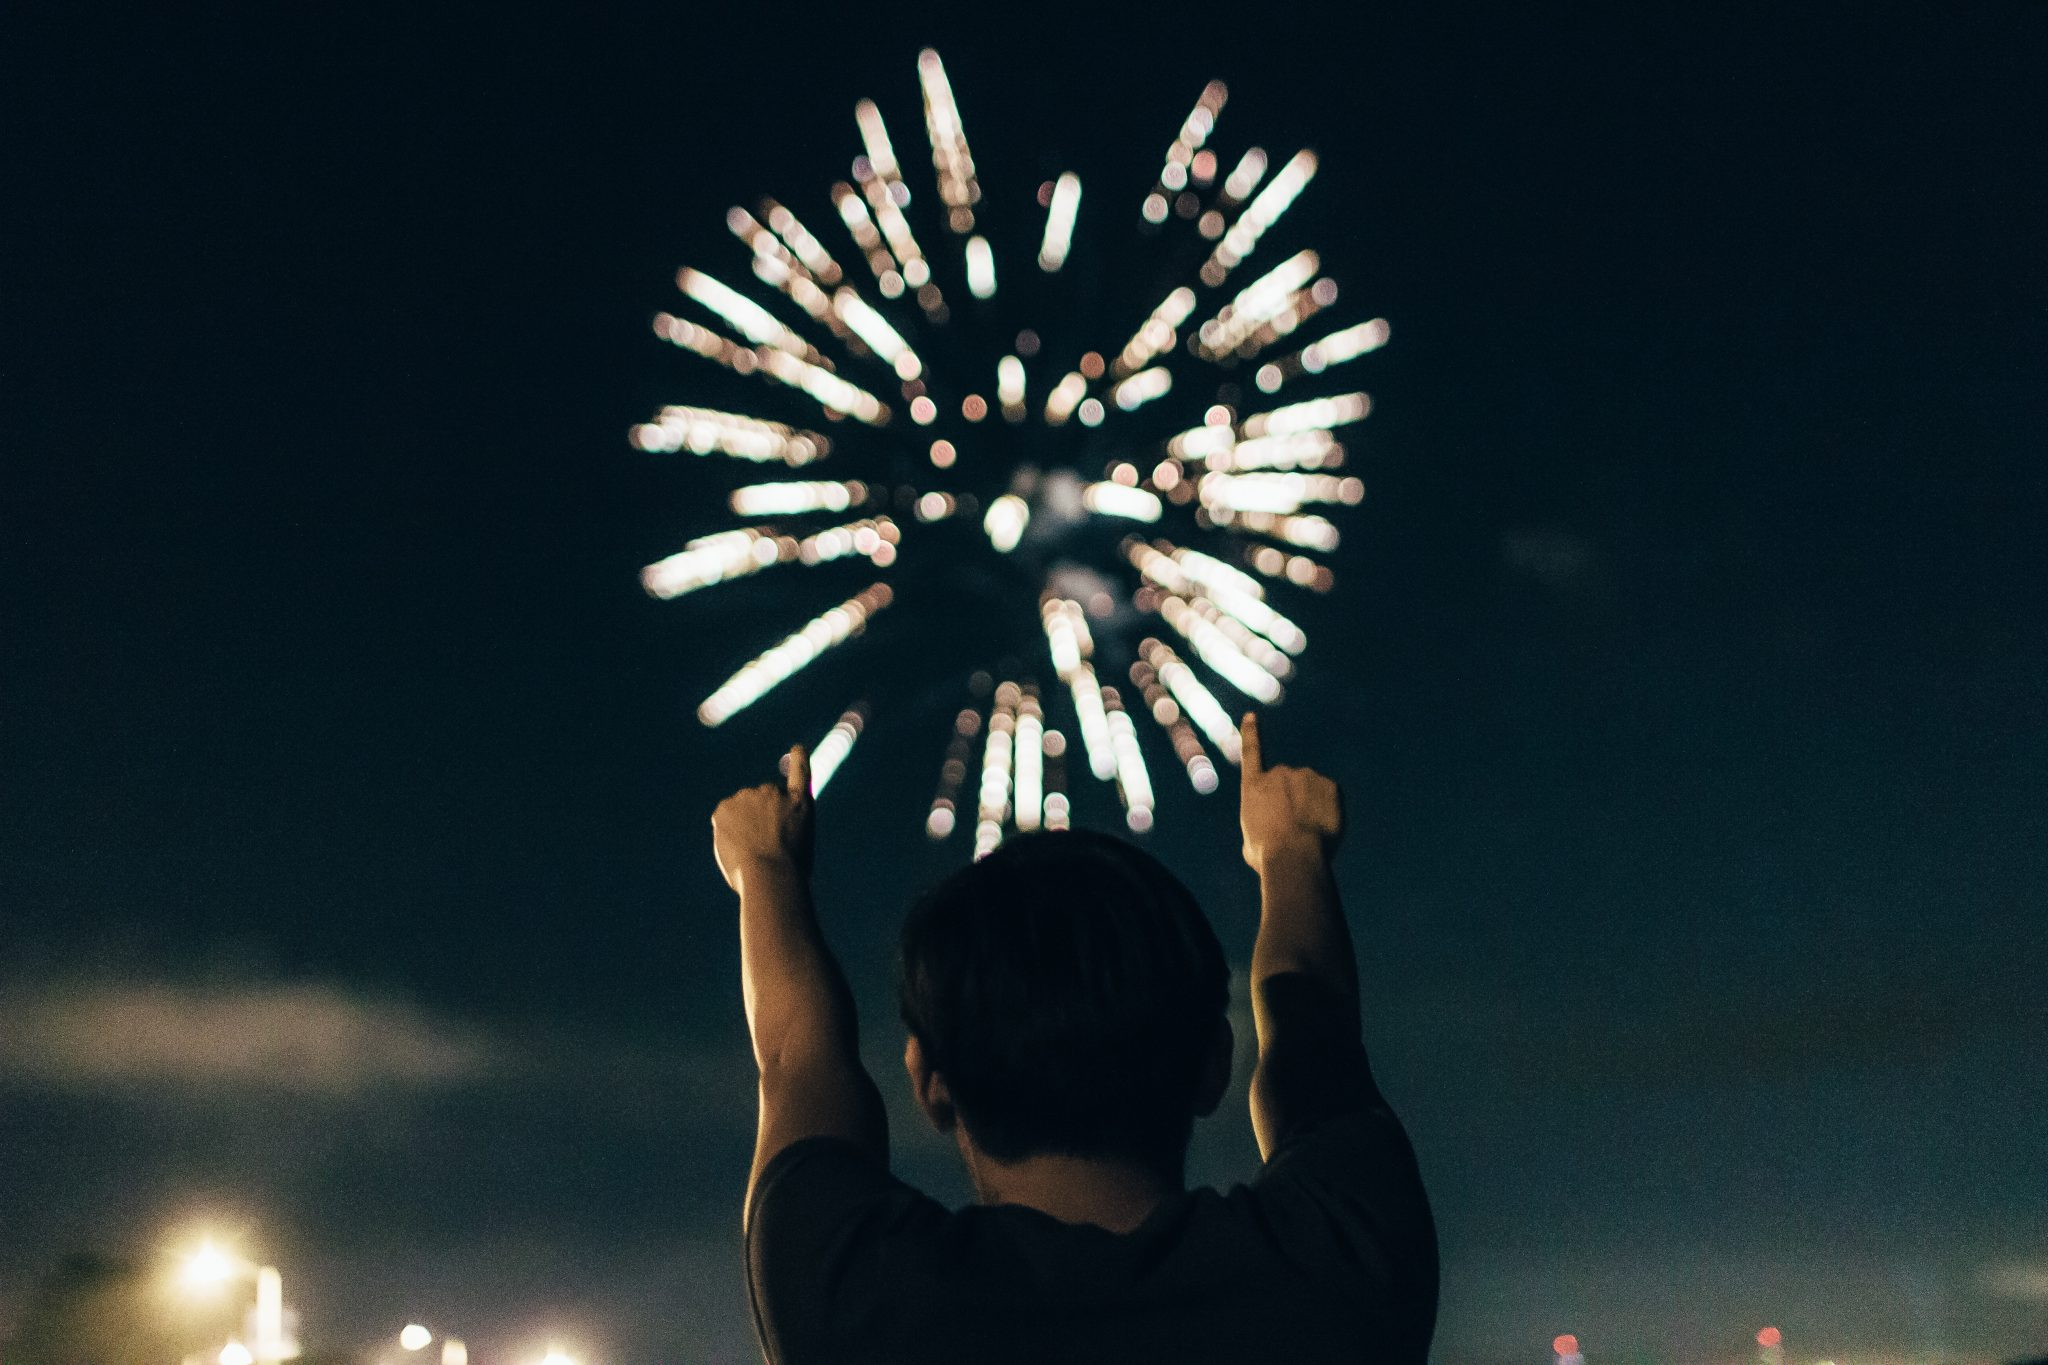 End of 2017 Fireworks